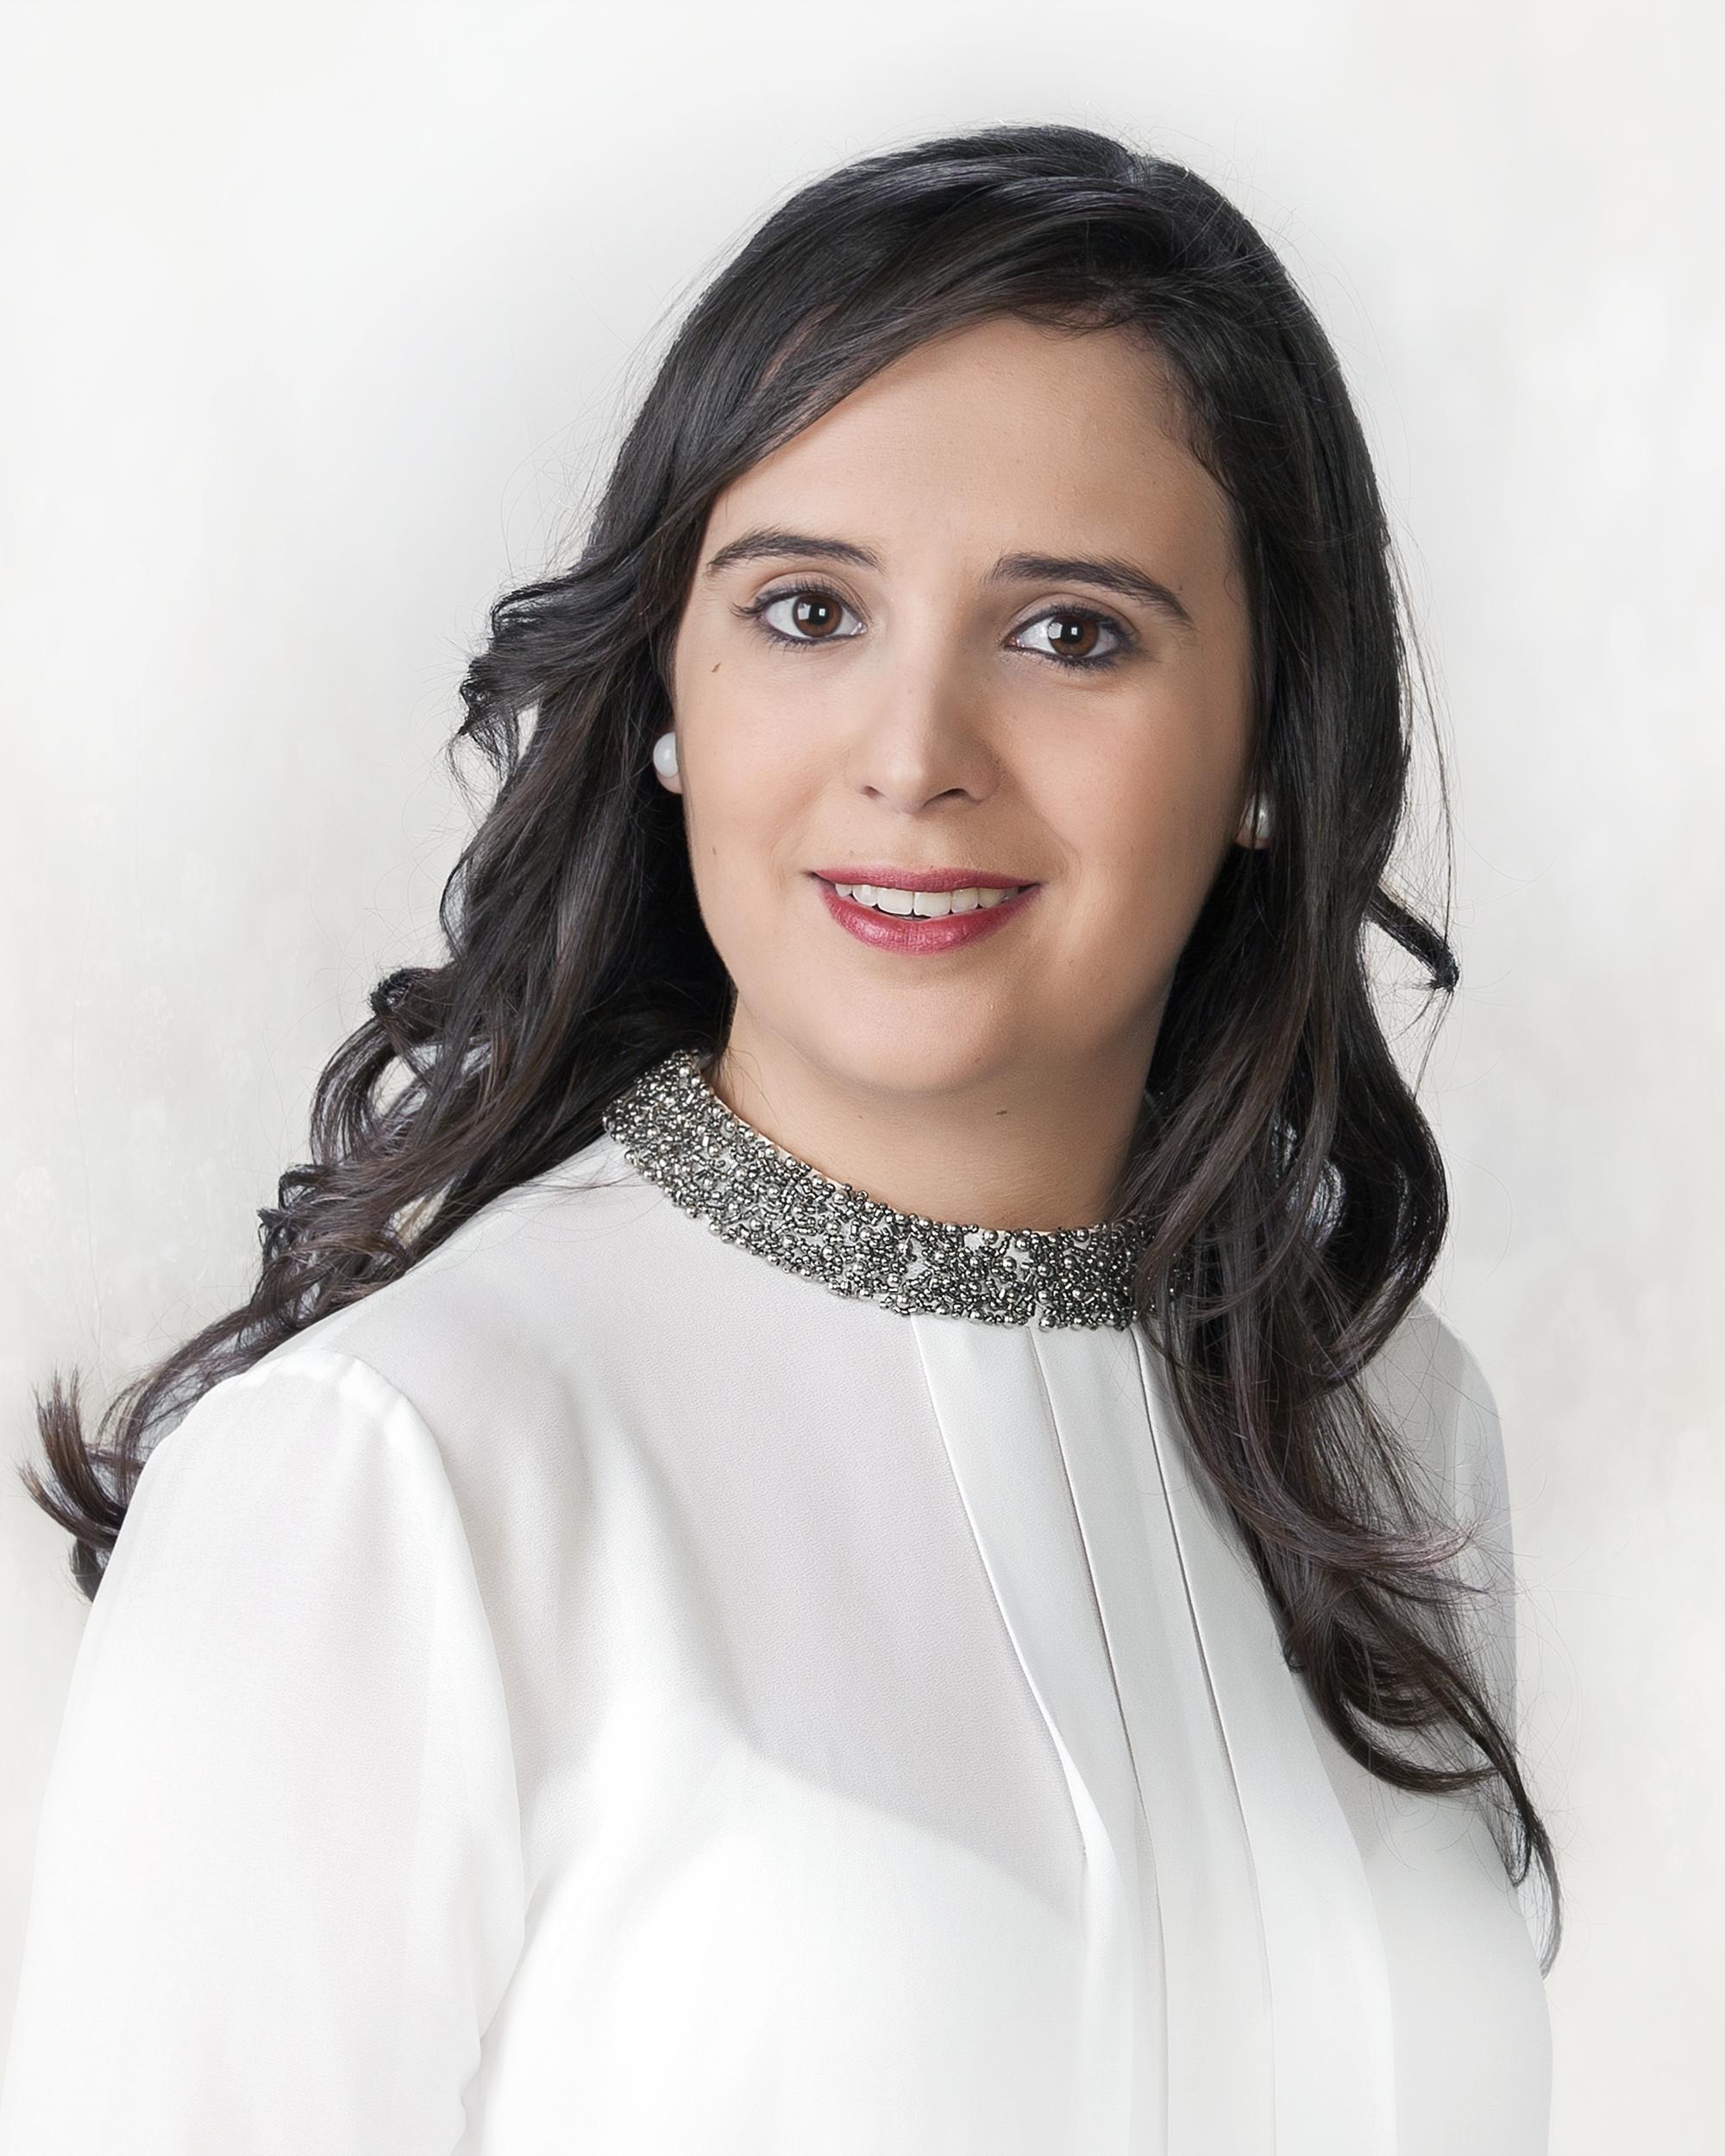 ELISA FERRER Musa año 2015